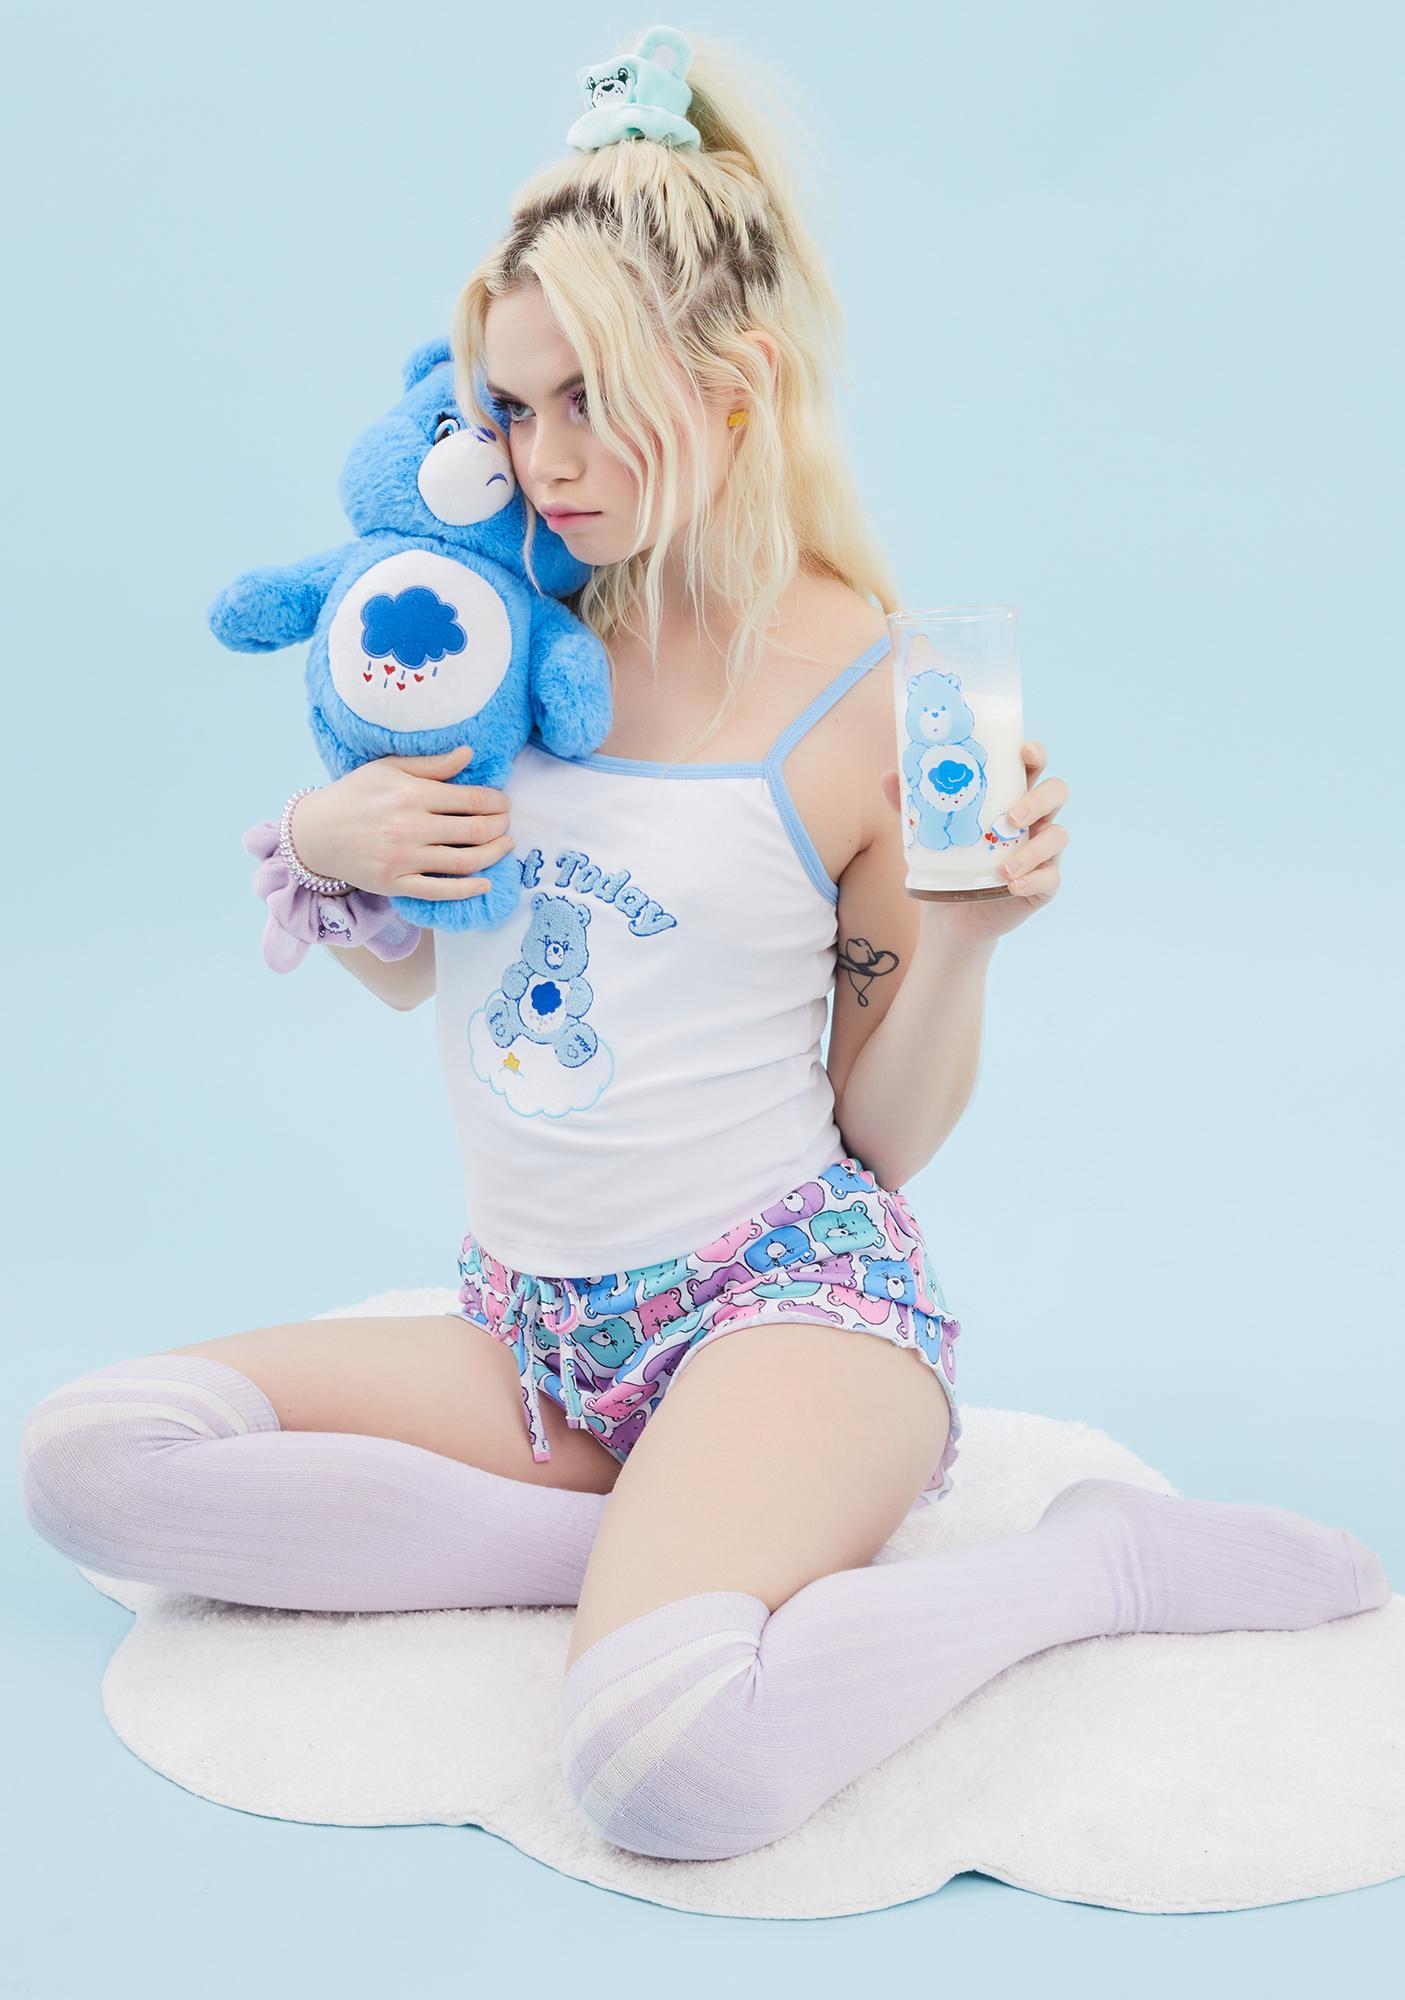 Dolls Kill x Care Bears Grumpy Not Mad Pajama Set